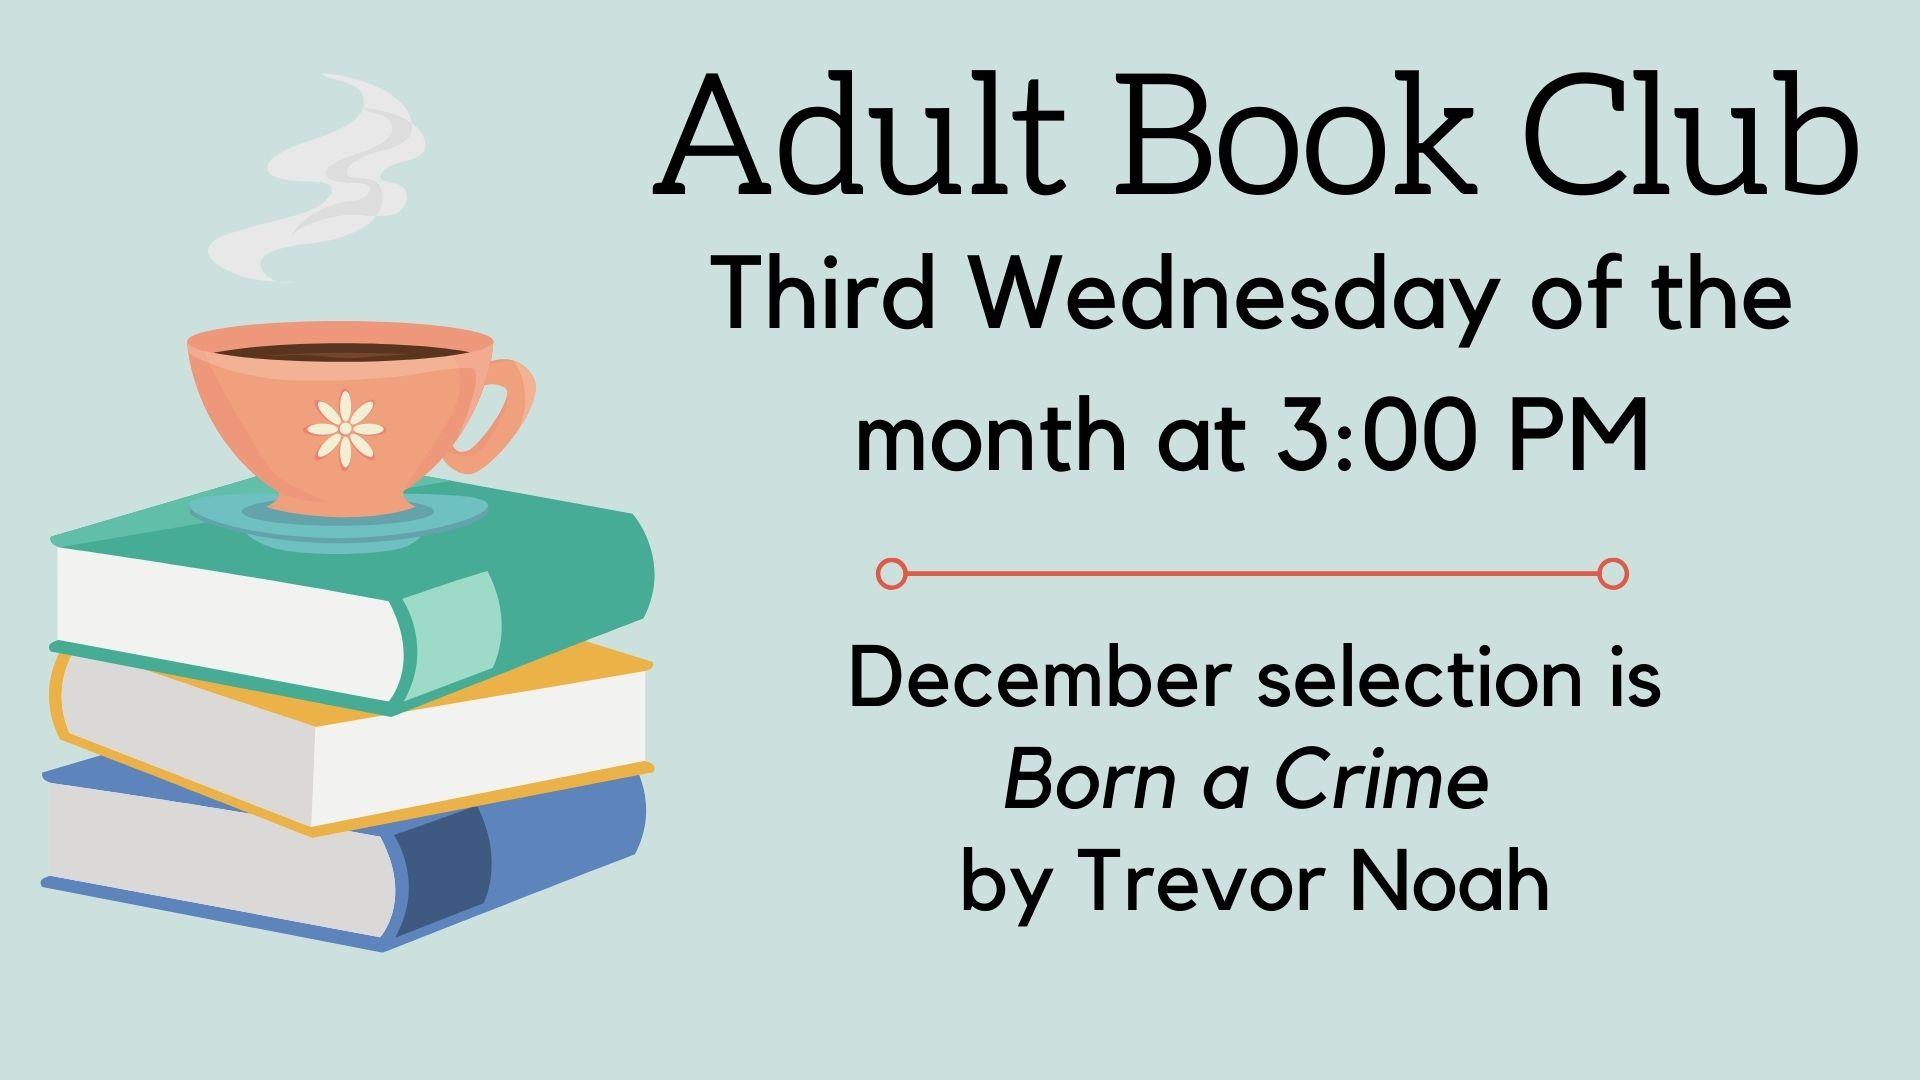 Born a Crime Adult Book Club